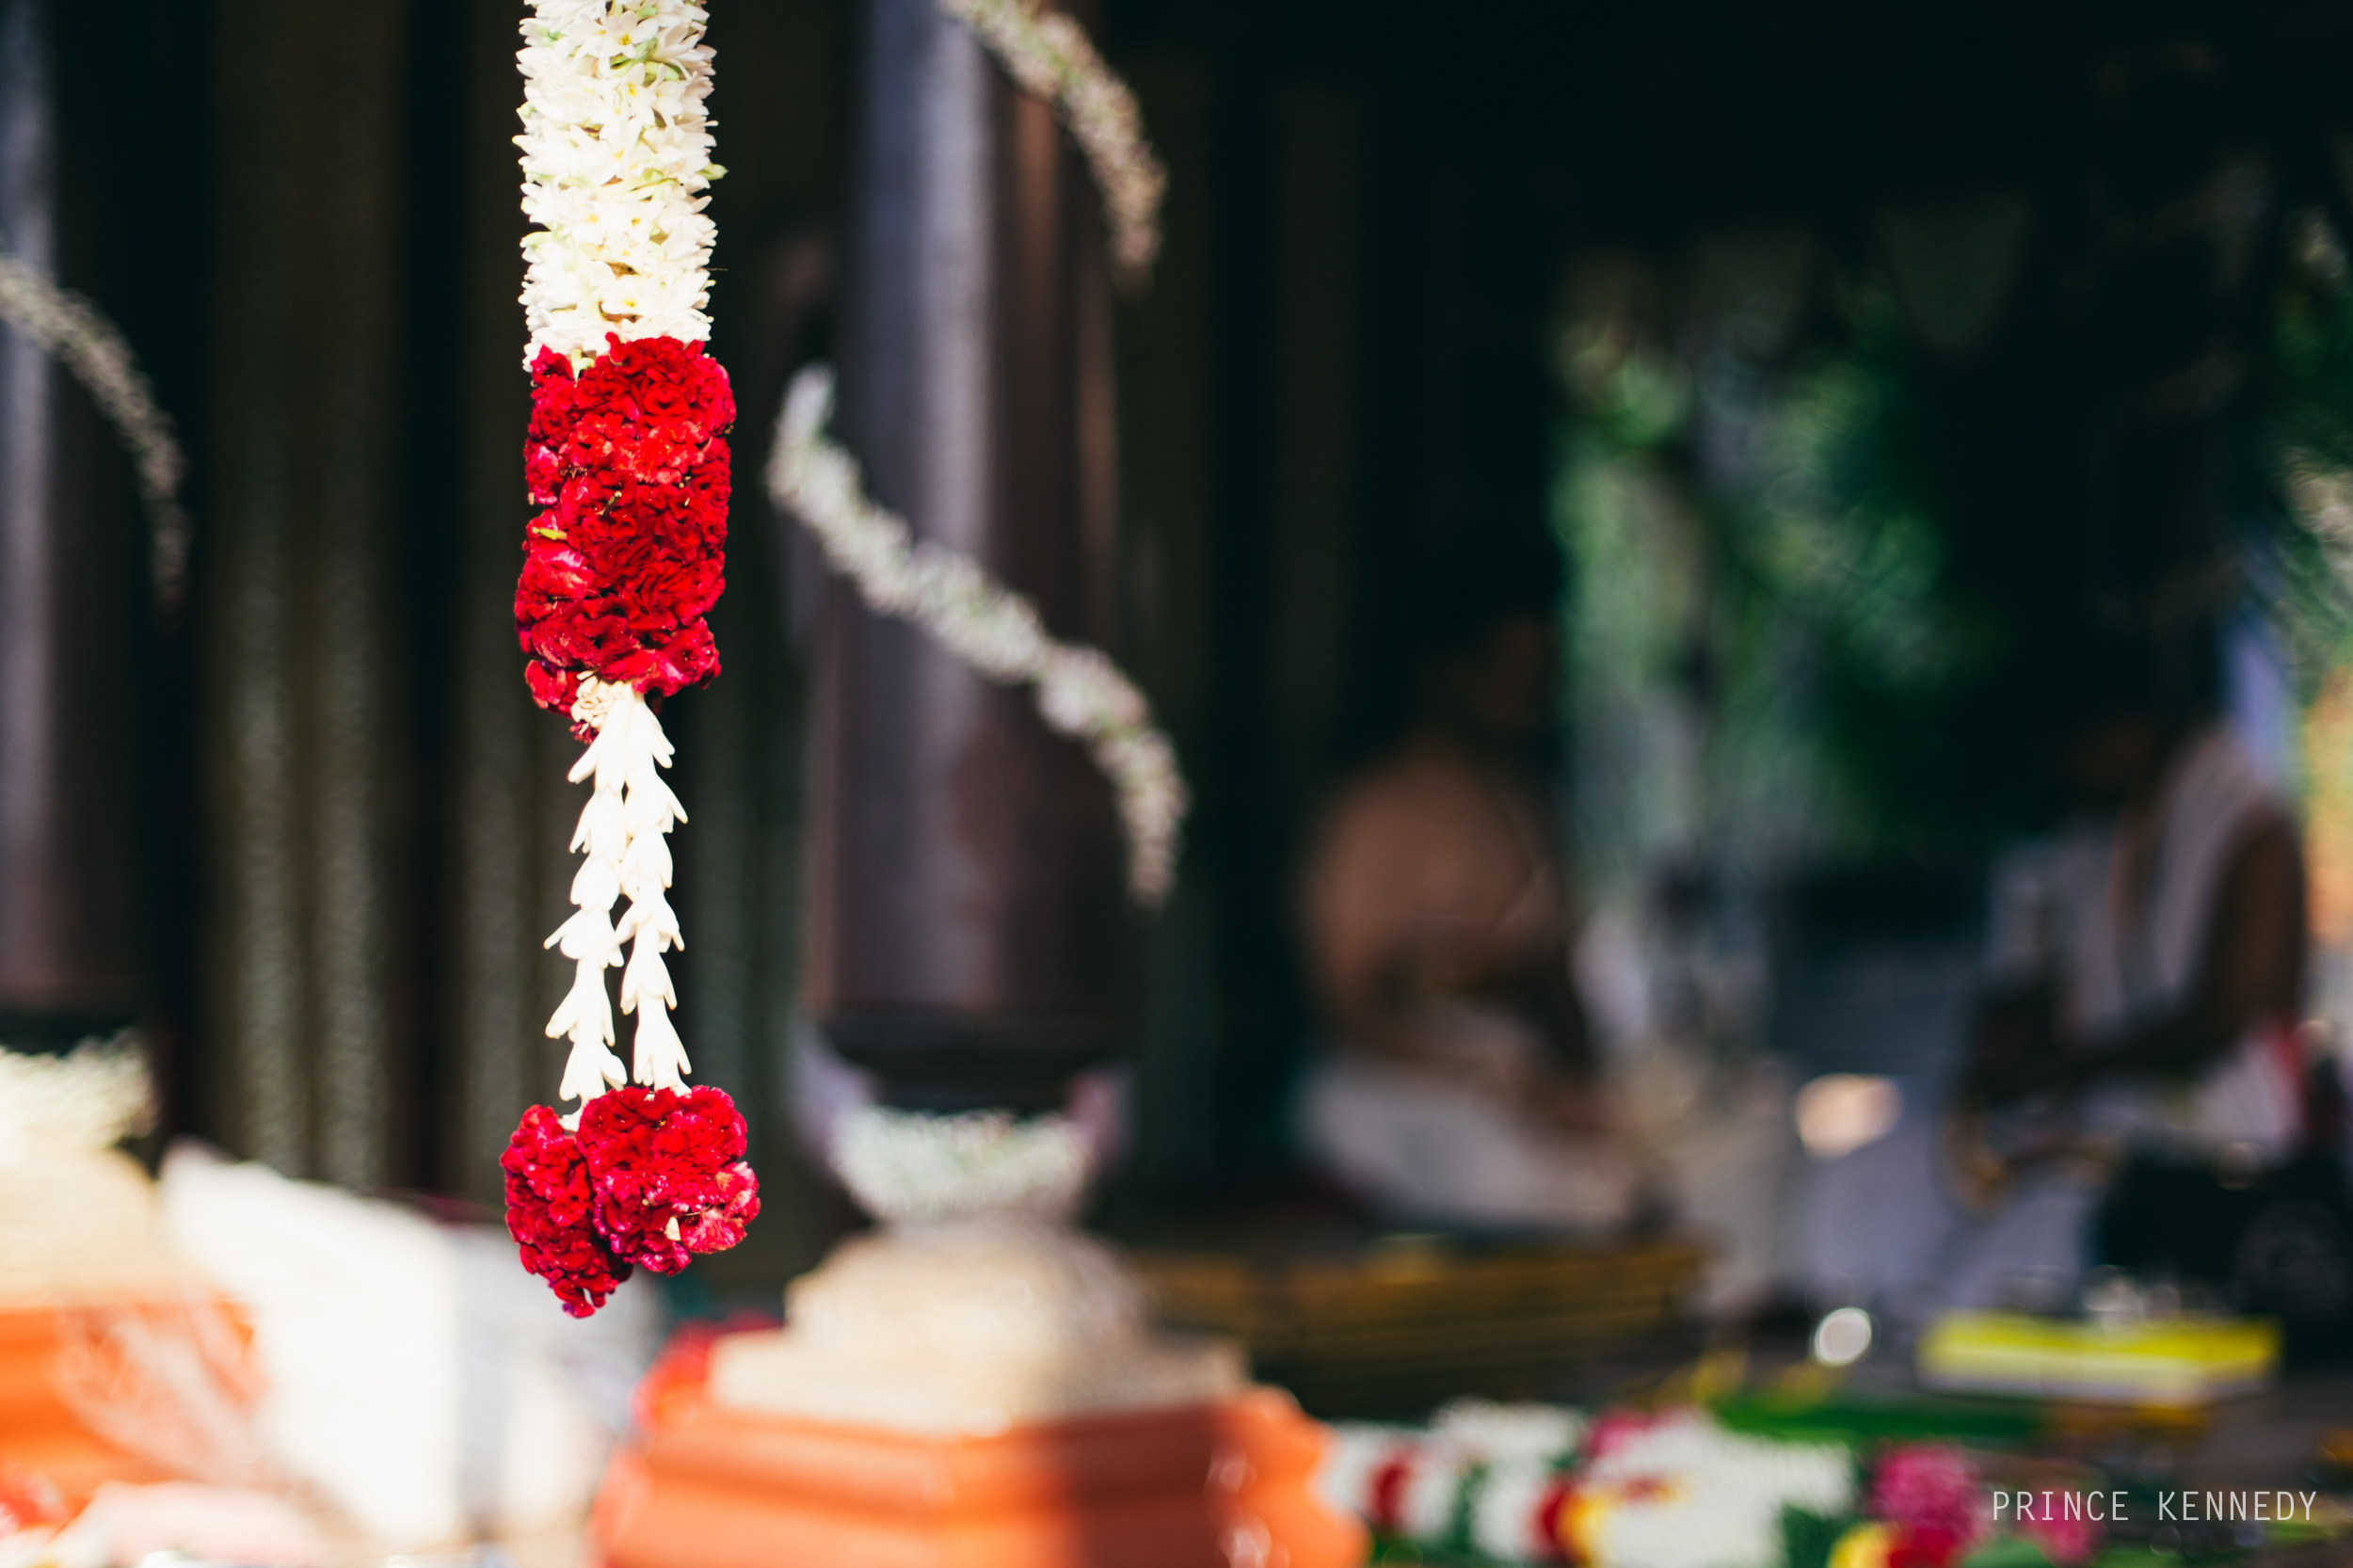 Athmajja-Nithesh-Engagement-Couple-Portrait-Portraiture-Wedding-Couple-Portrait-Chennai-Photographer-Candid-Photography-Destination-Best-Prince-Kennedy-Photography.jpg